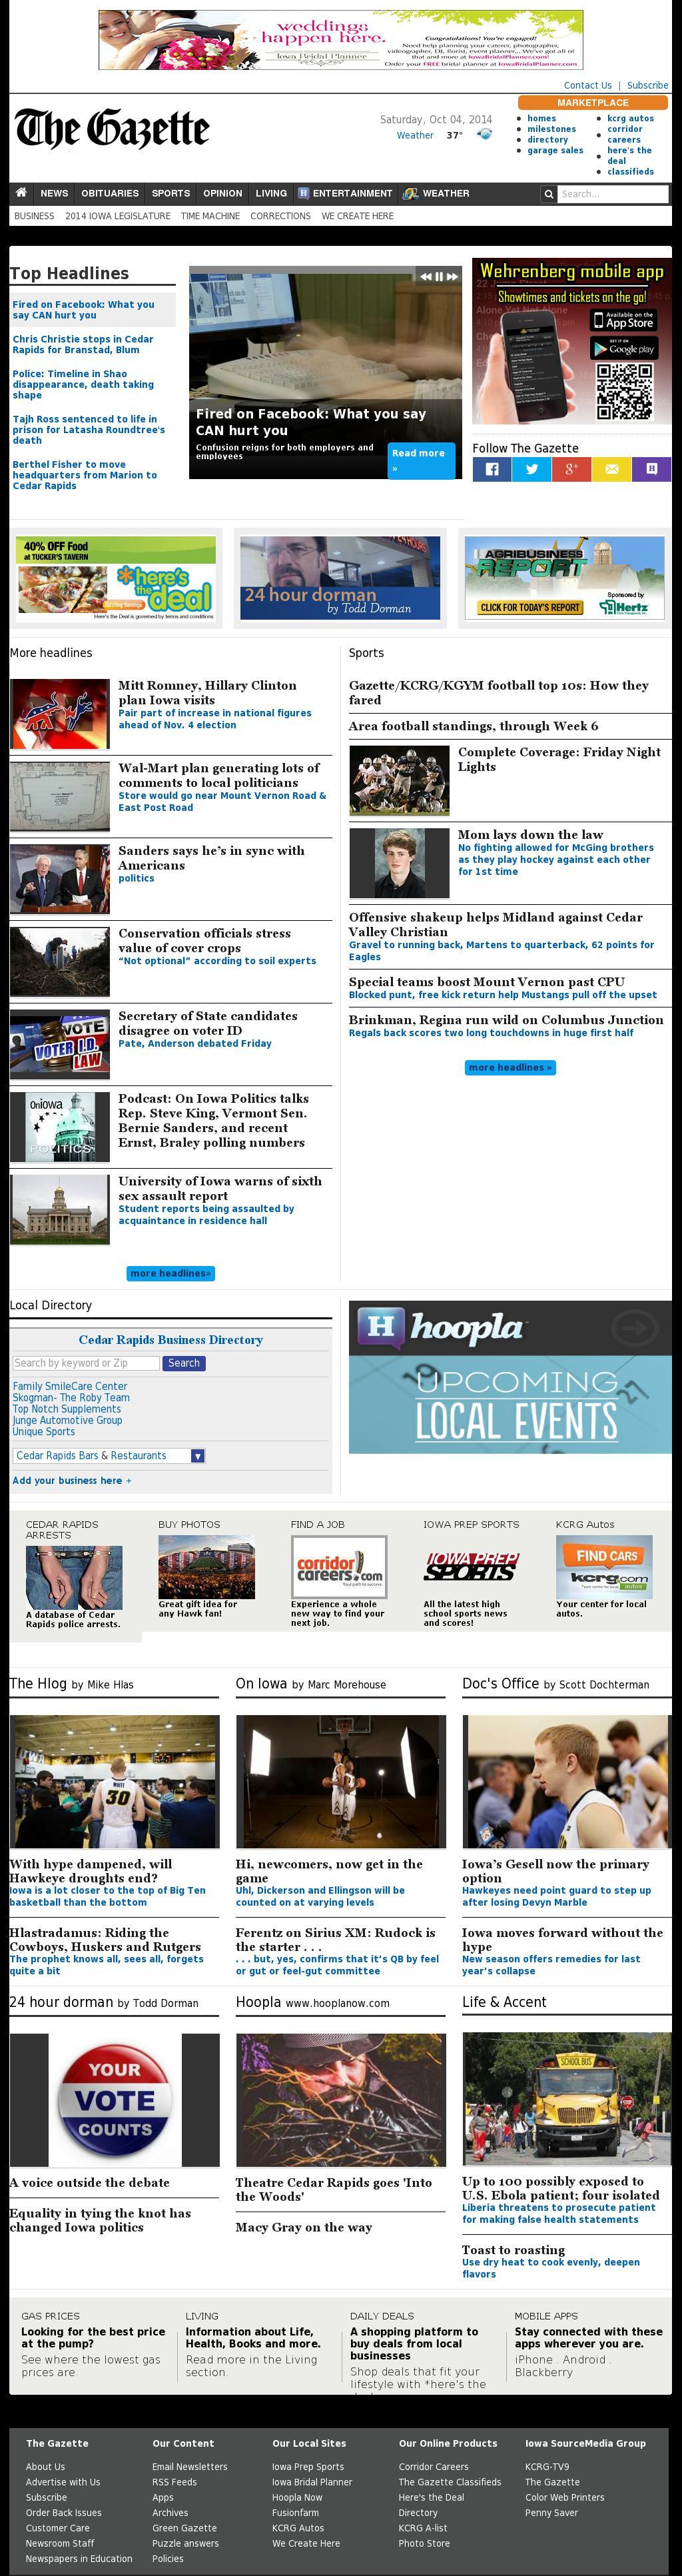 The (Cedar Rapids) Gazette at Saturday Oct. 4, 2014, 10:05 a.m. UTC